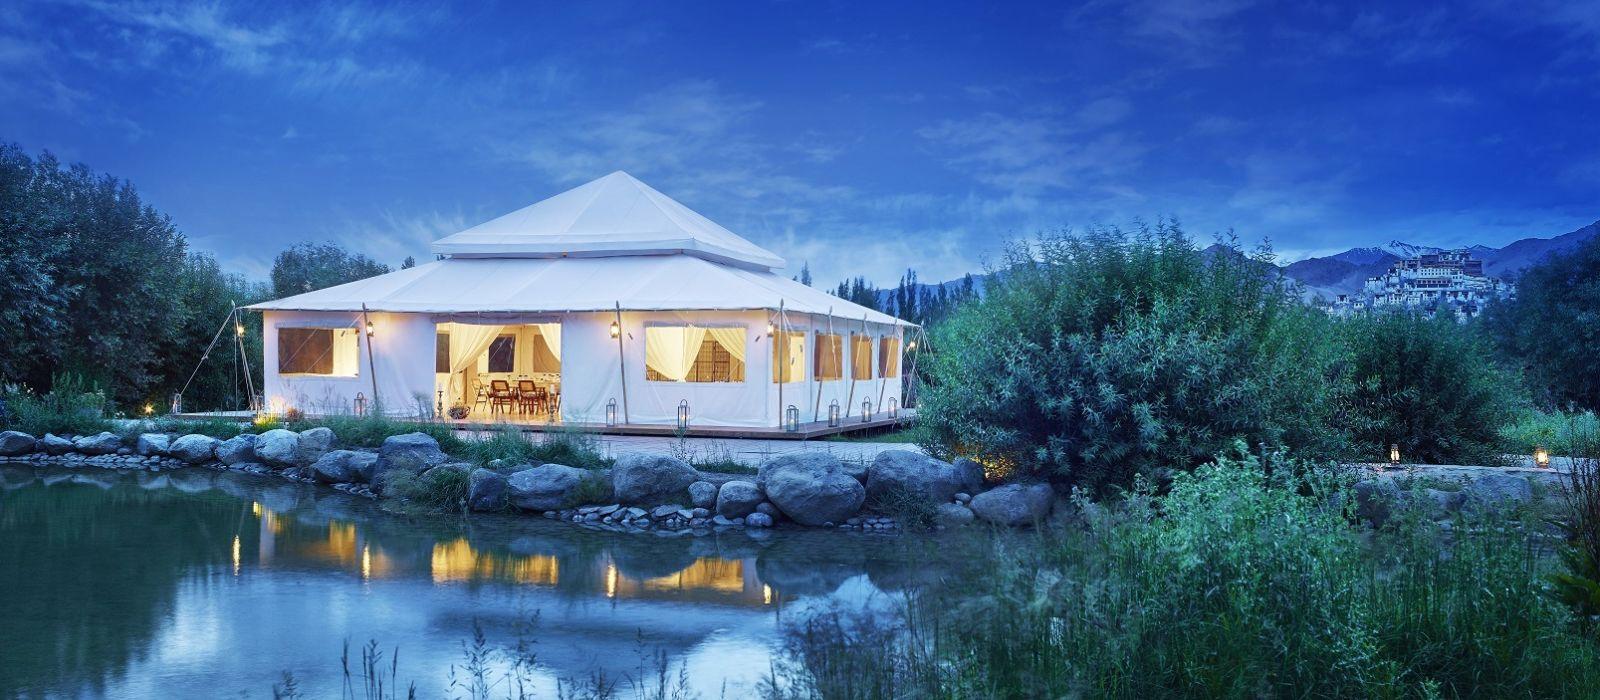 Luxurious North India & The Himalayas Tour Trip 6